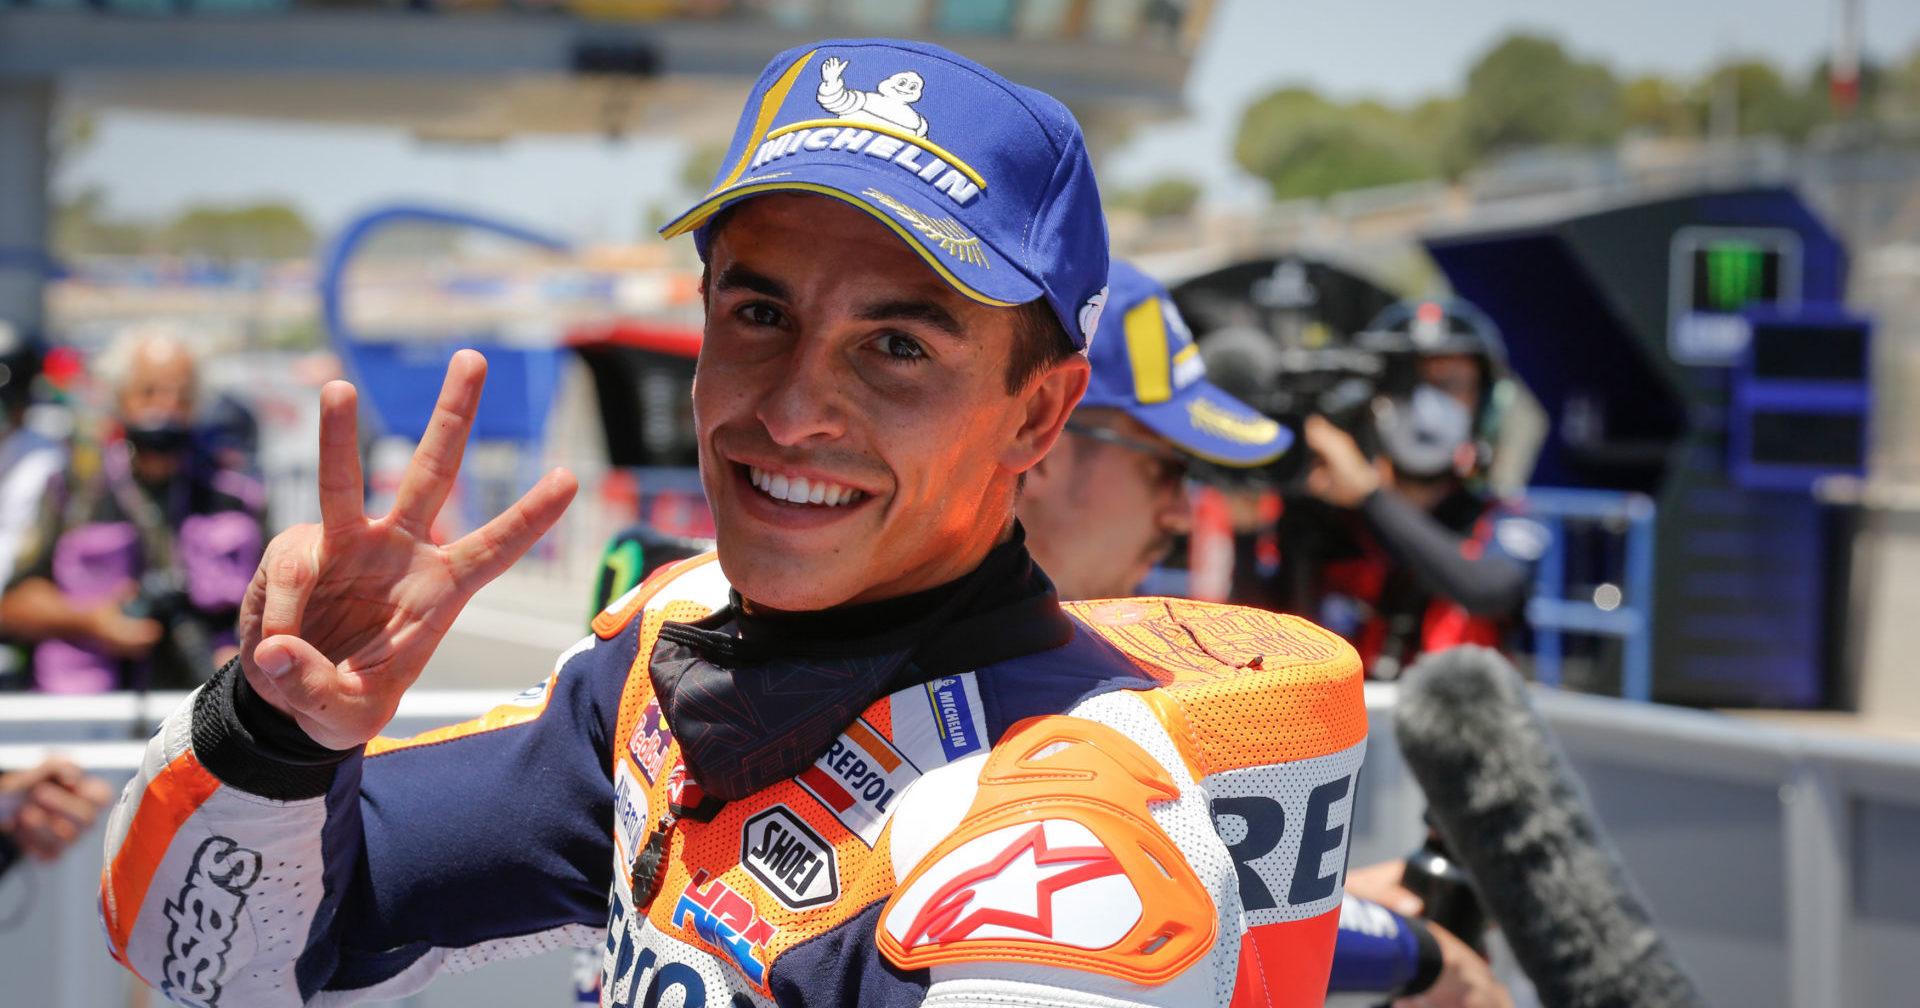 Marc Marquez, after qualifying July 18 at Jerez. Photo courtesy Repsol Honda.